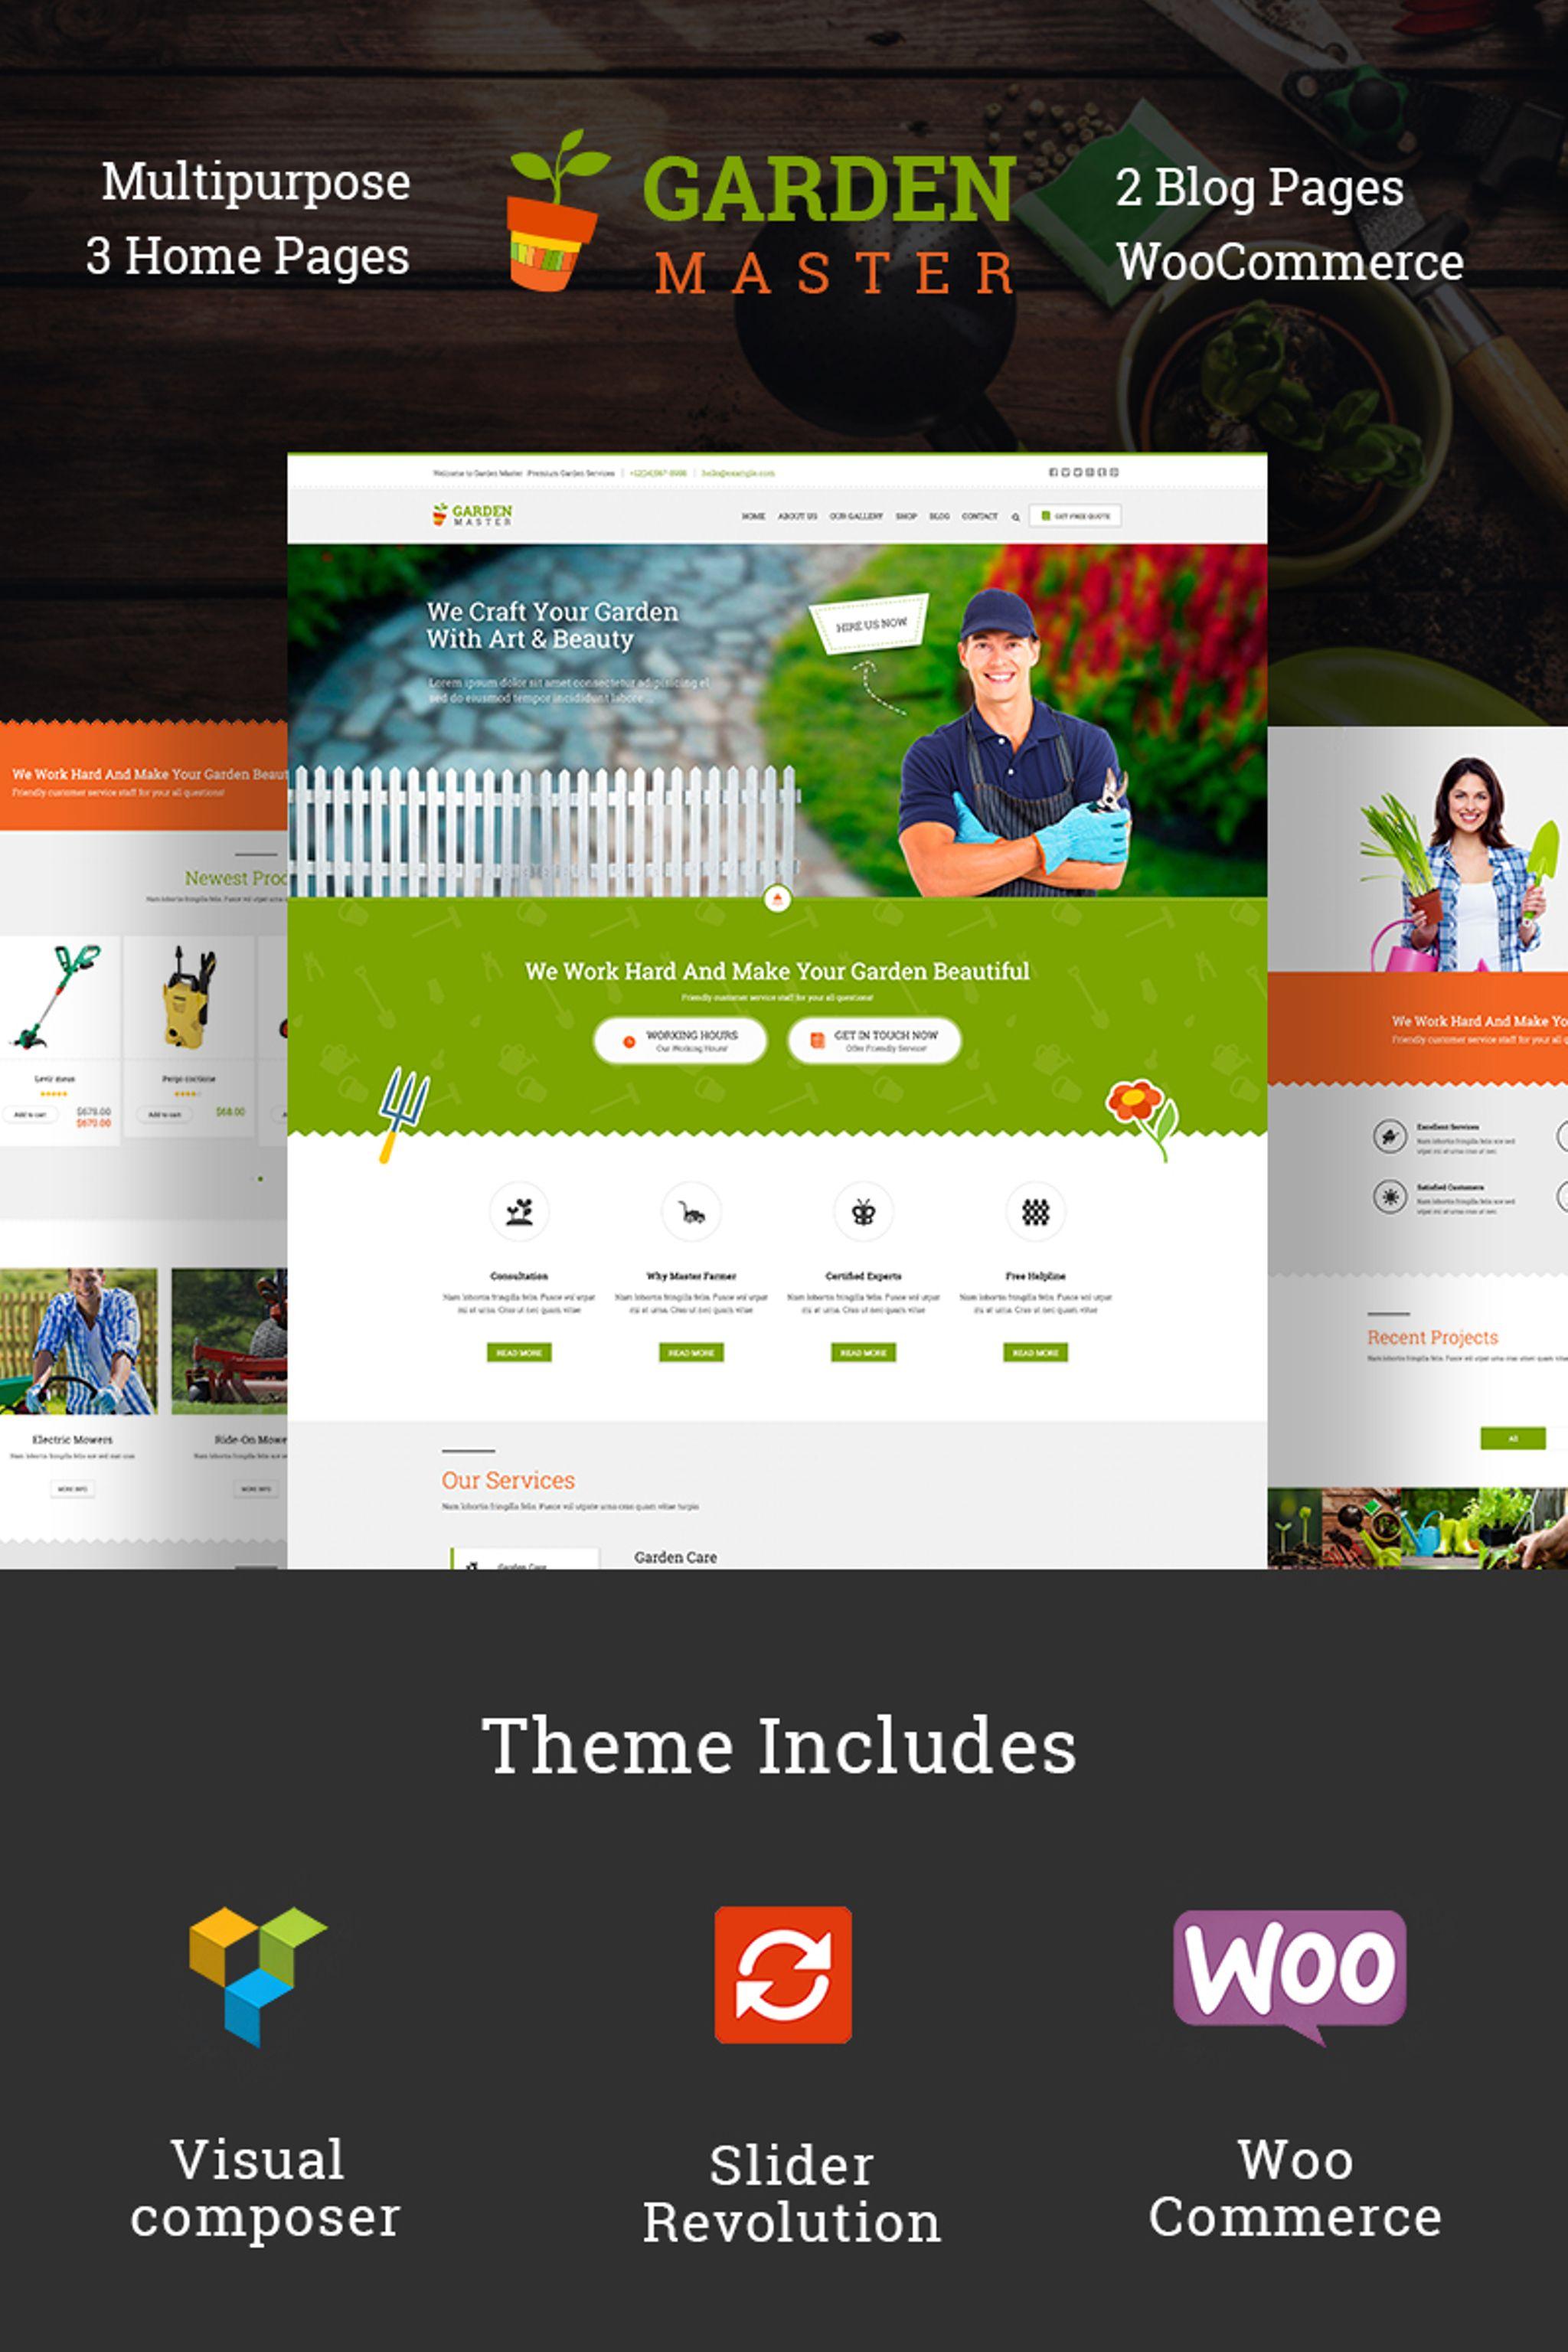 WPML-kész Garden Master WordPress sablon 67136